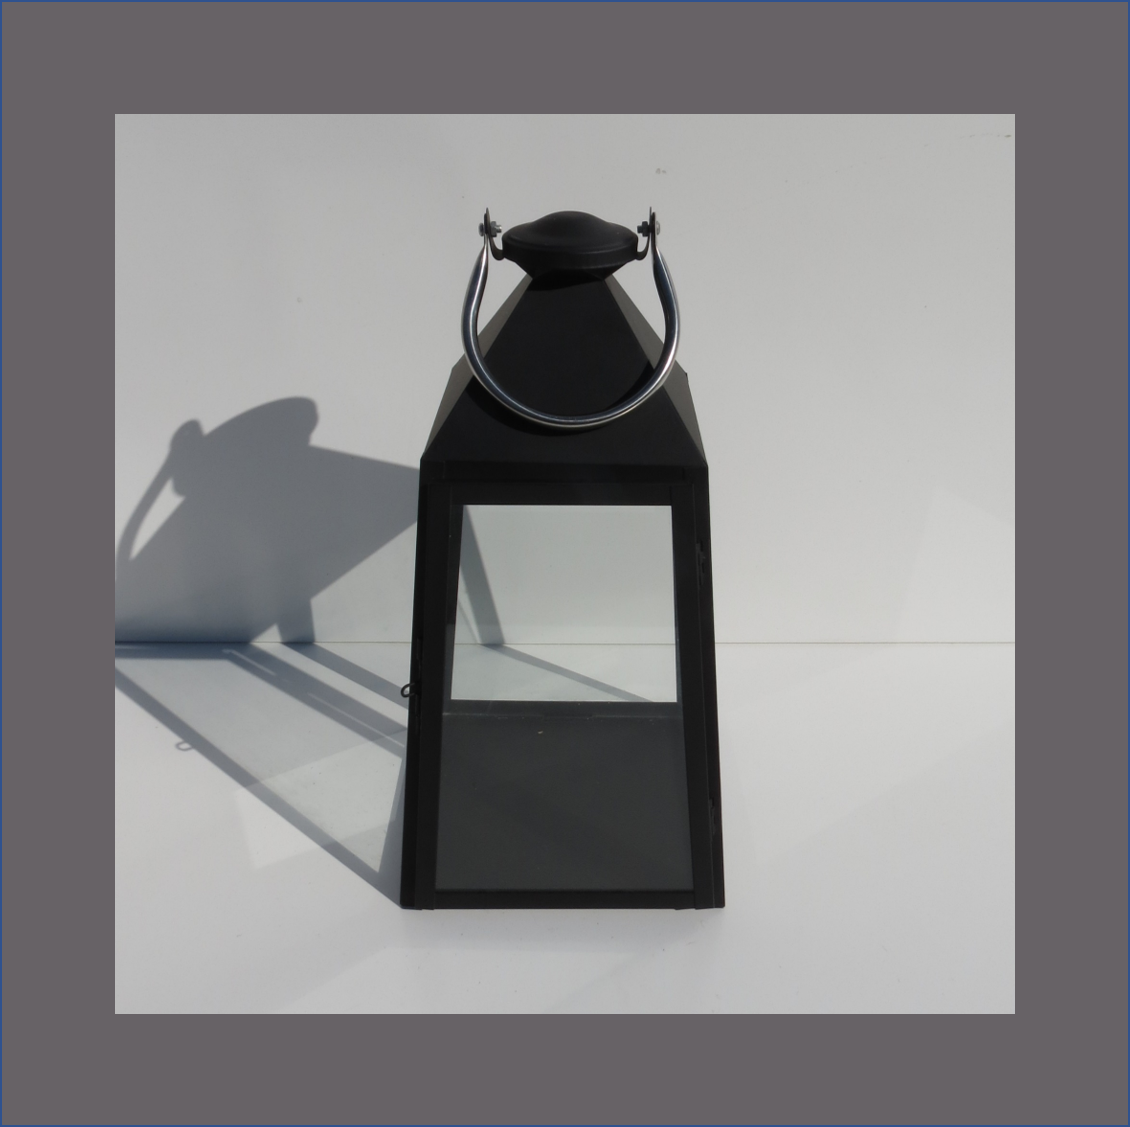 old-london-black-lamp